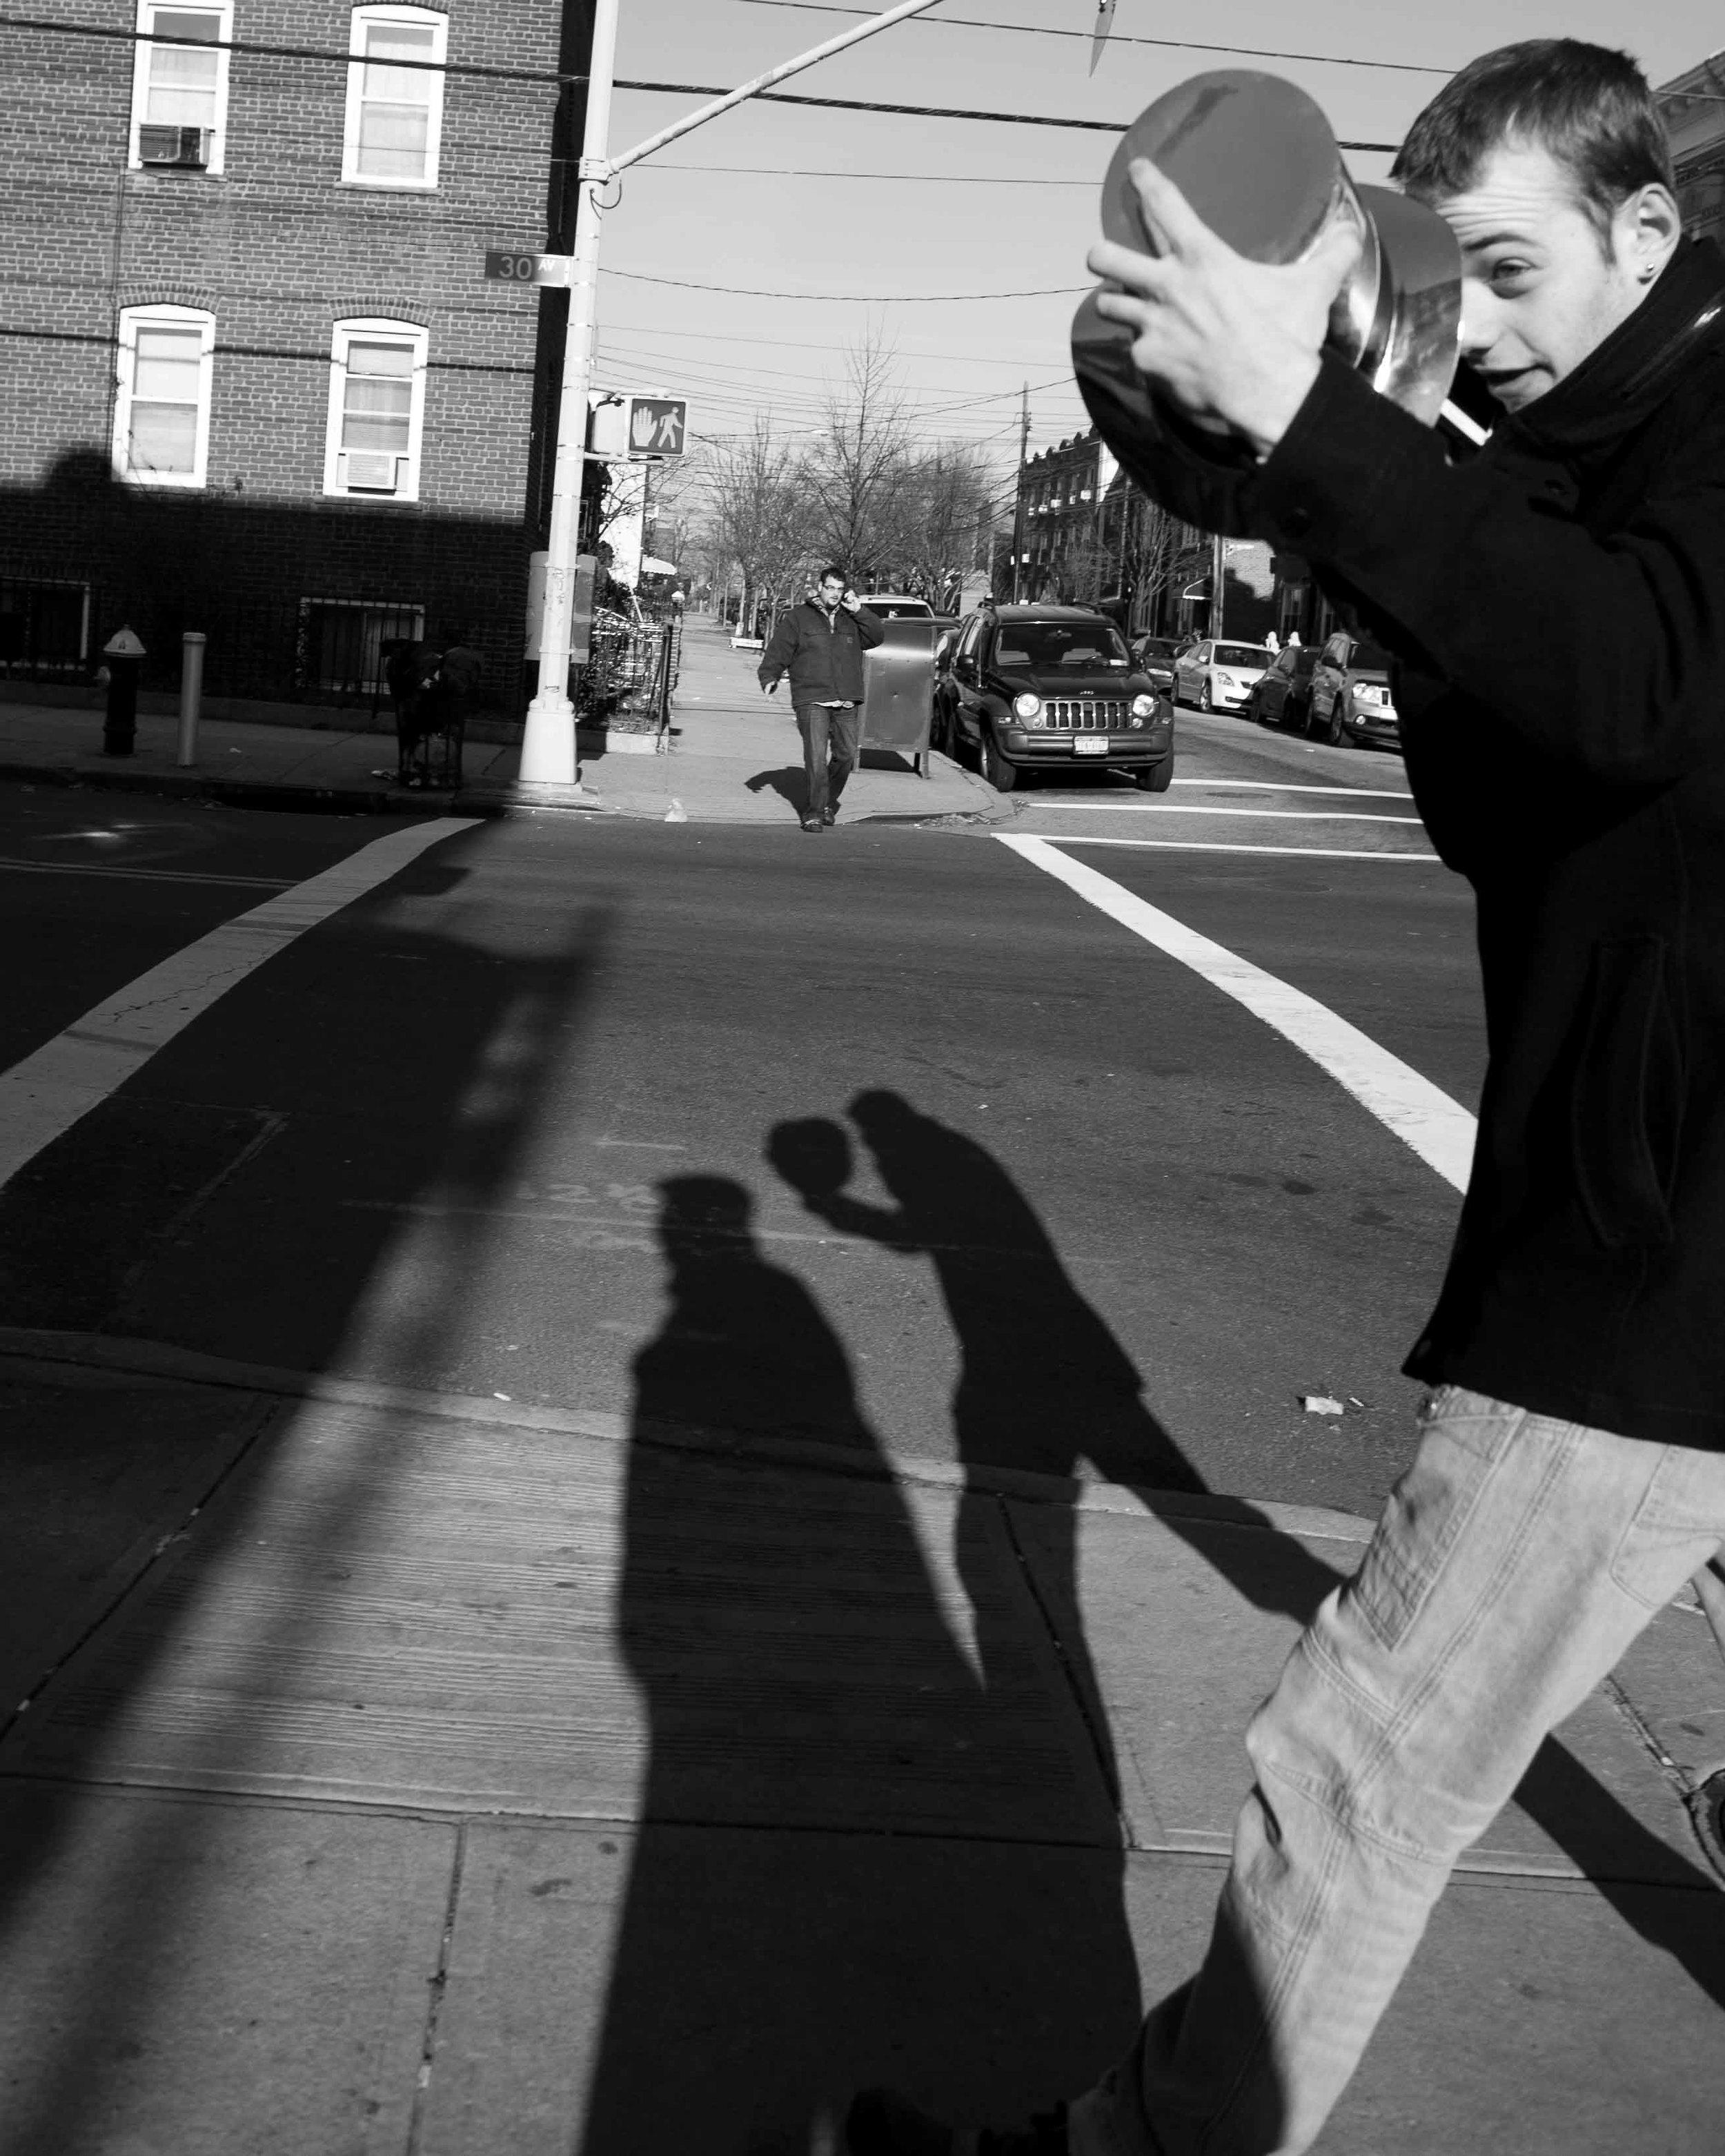 Streetphotography 3.0-47.jpg